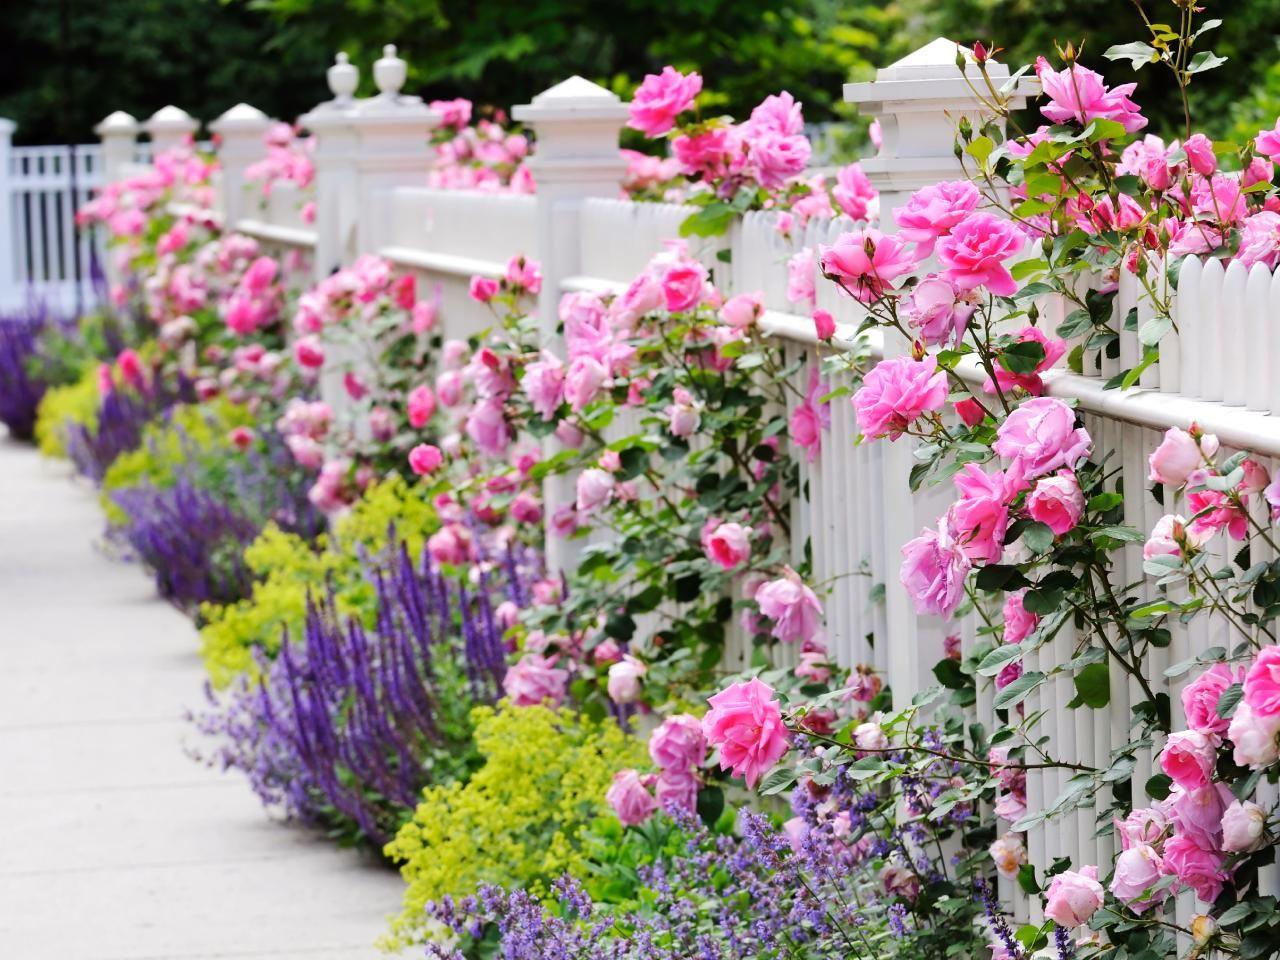 Four Beautiful Landscape Updates | Outdoor Design - Landscaping Ideas, Porches, Decks, & Patios | HGTV